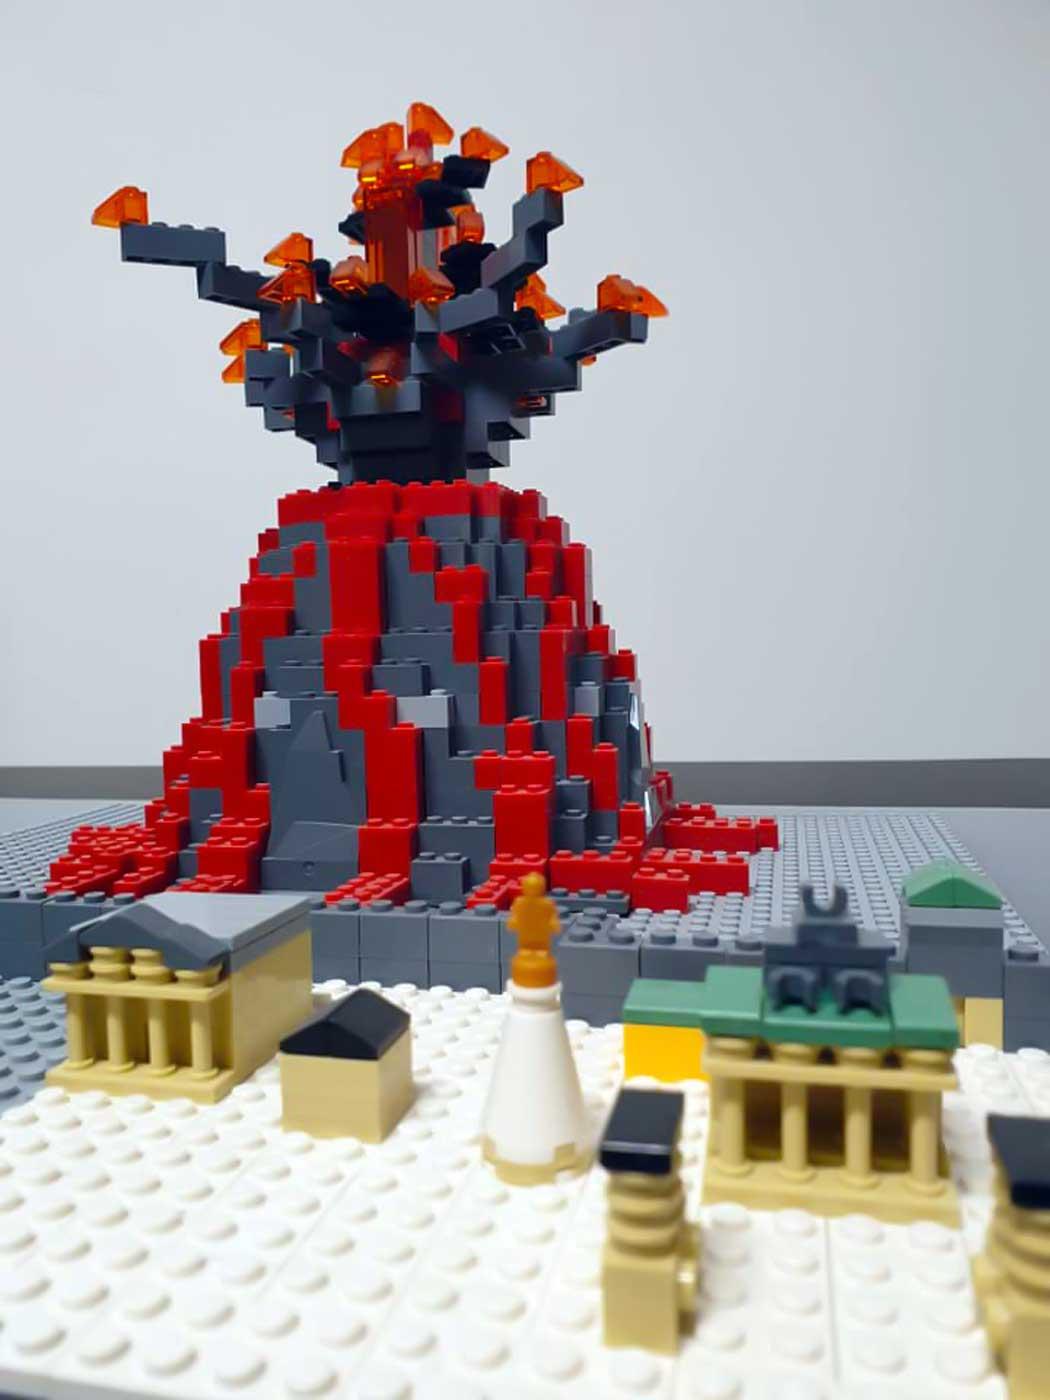 brickers lego accademia del fantastico